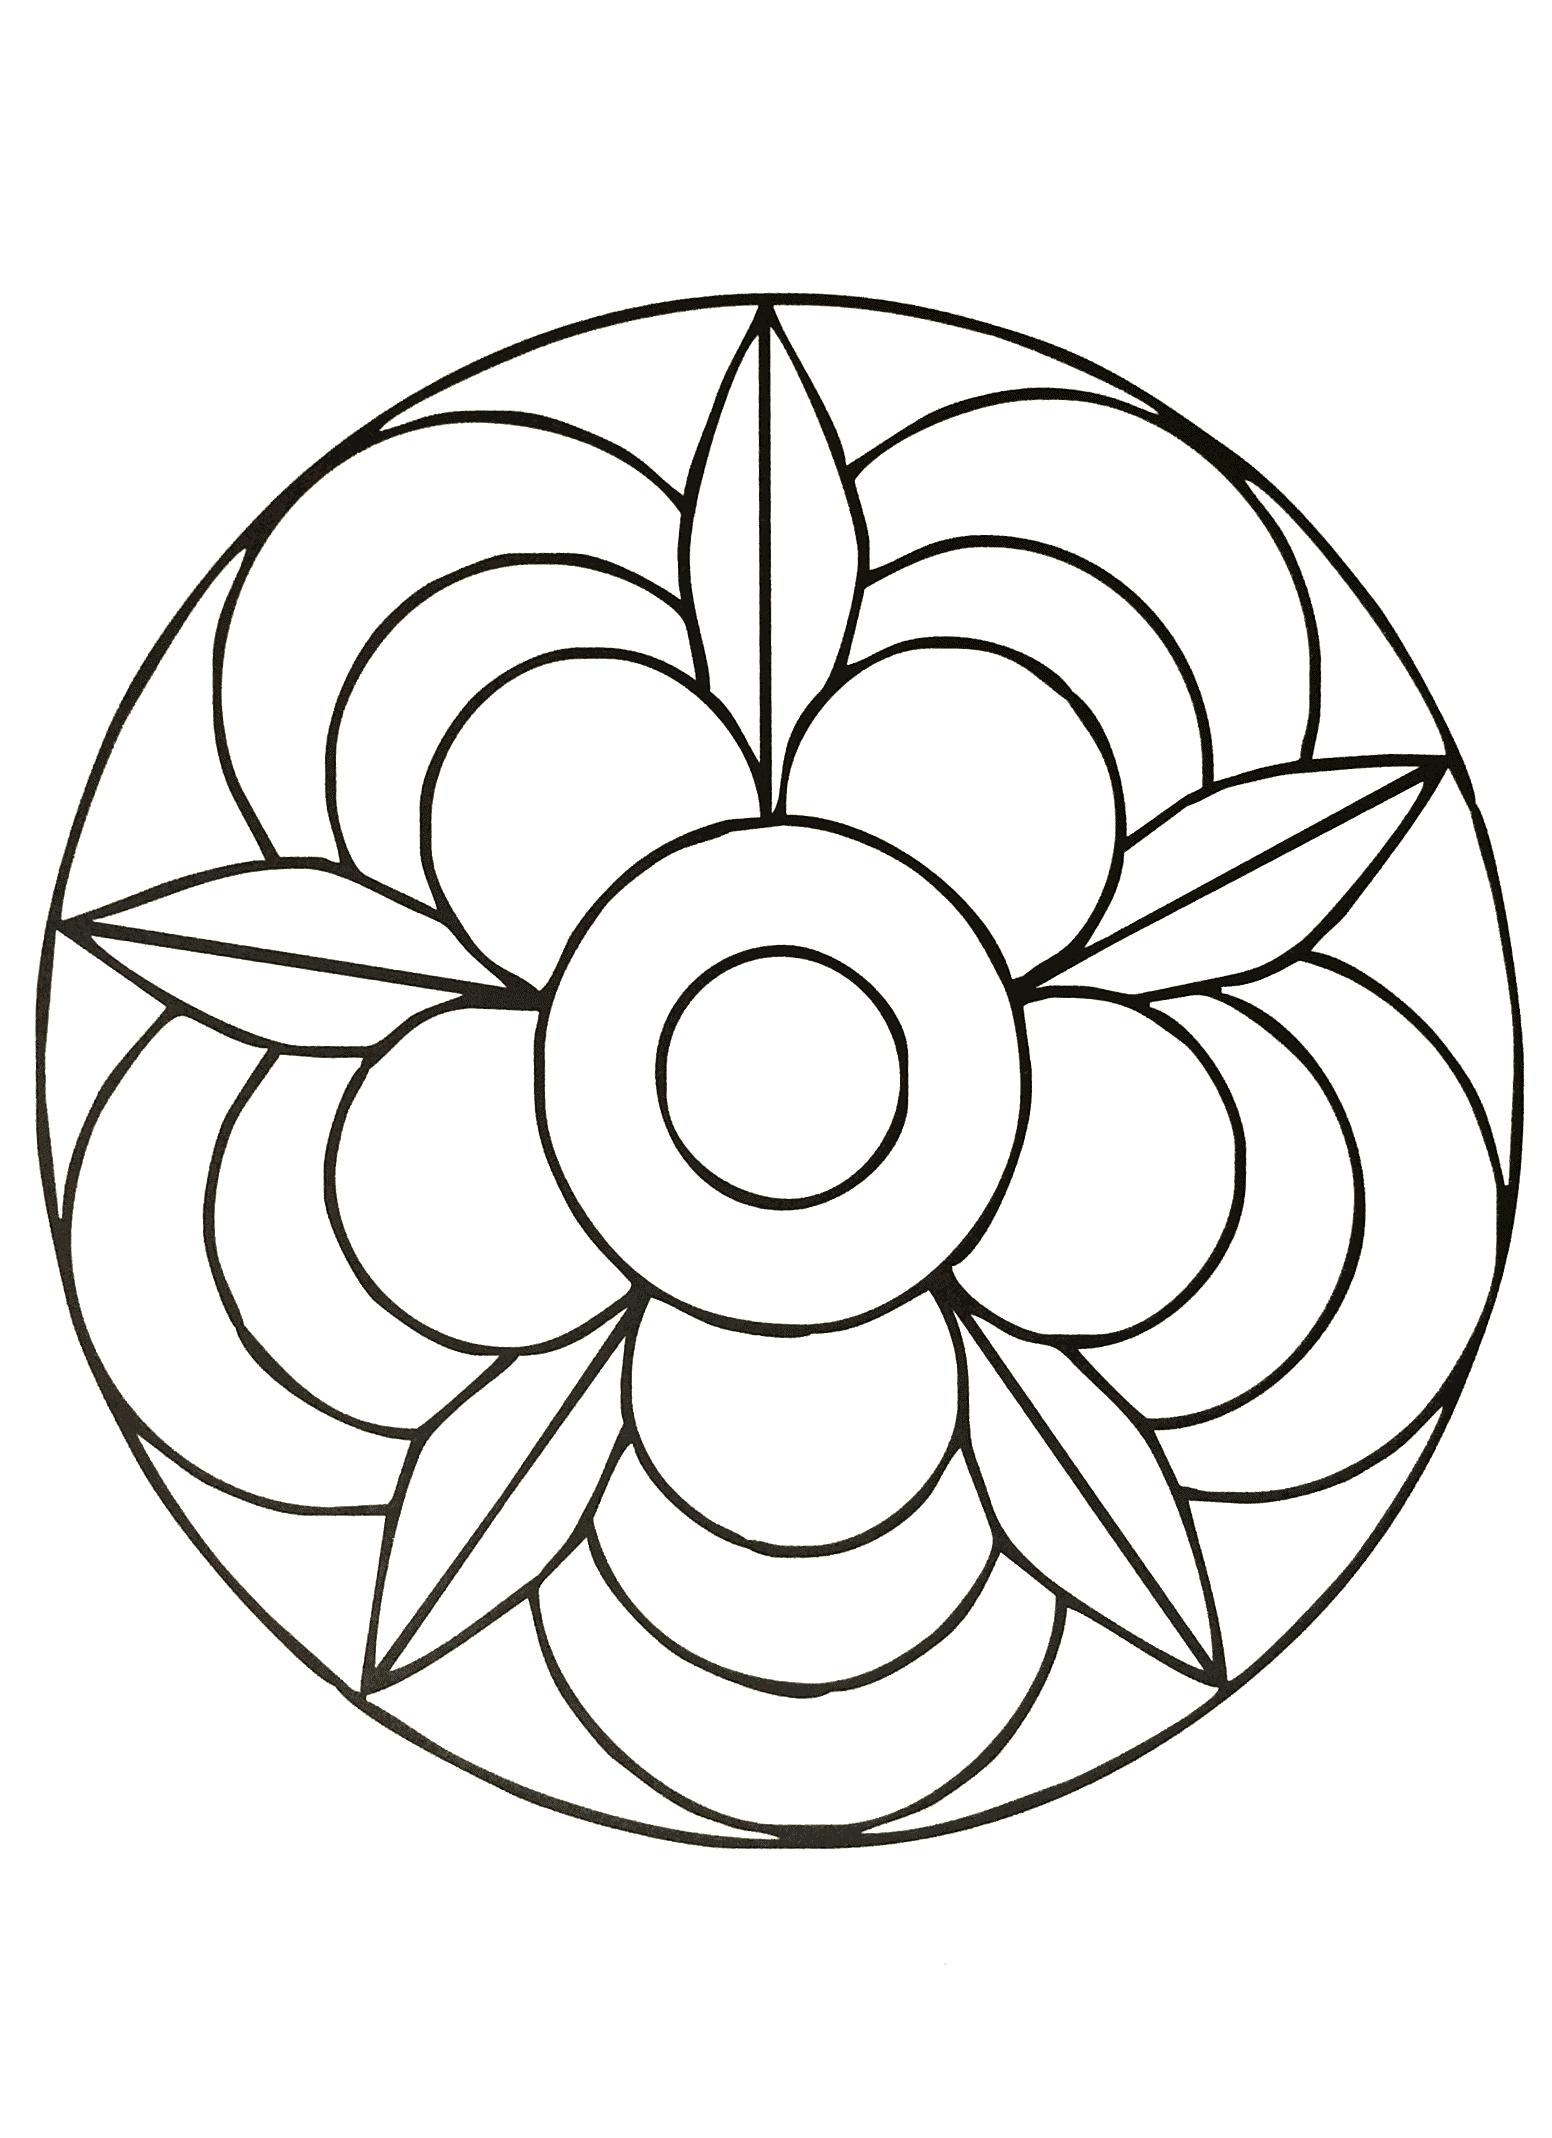 Mandalas A Imprimer Gratuit 31 Mandalas Avec Motifs Geometriques